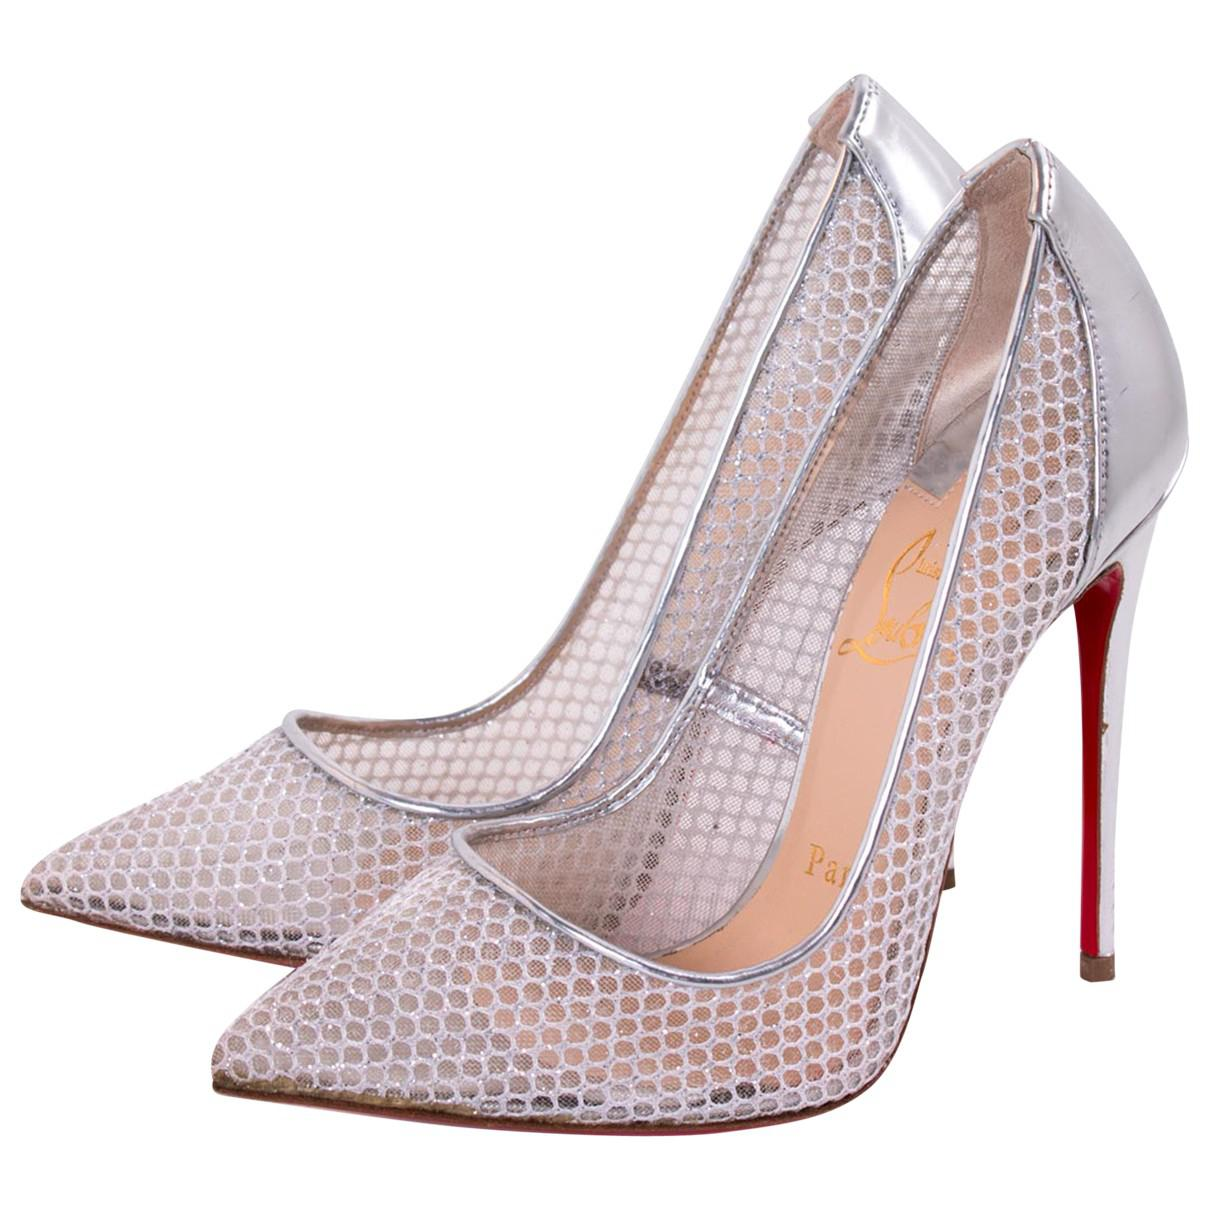 704d8572f51 Lyst - Christian Louboutin Heels in Metallic